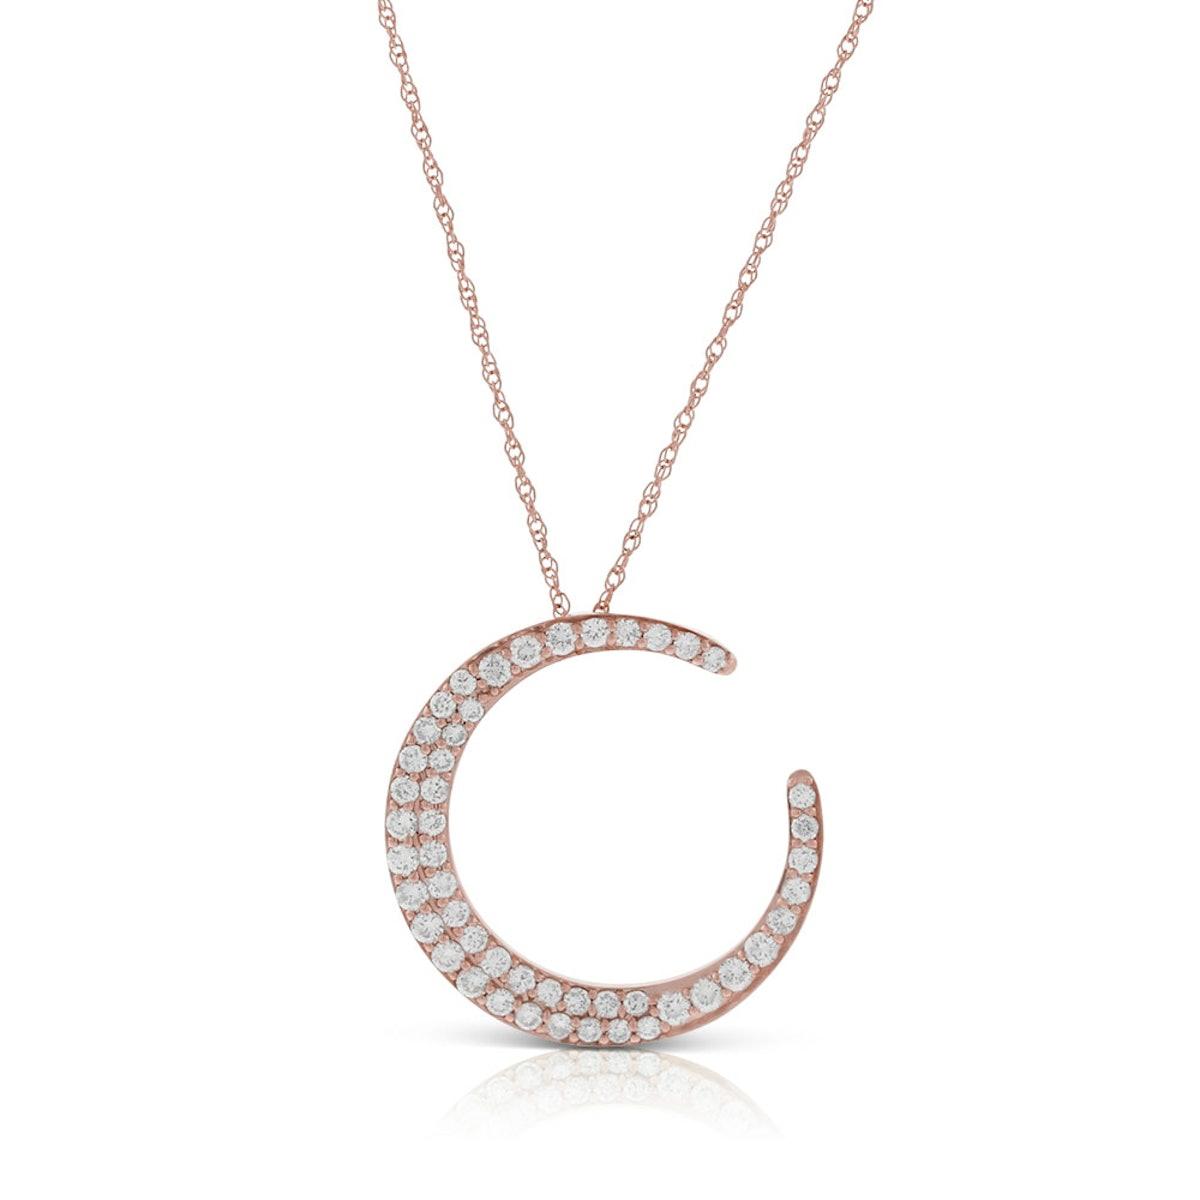 HOPECIRCLE Diamond Pendant in 14K Rose Gold